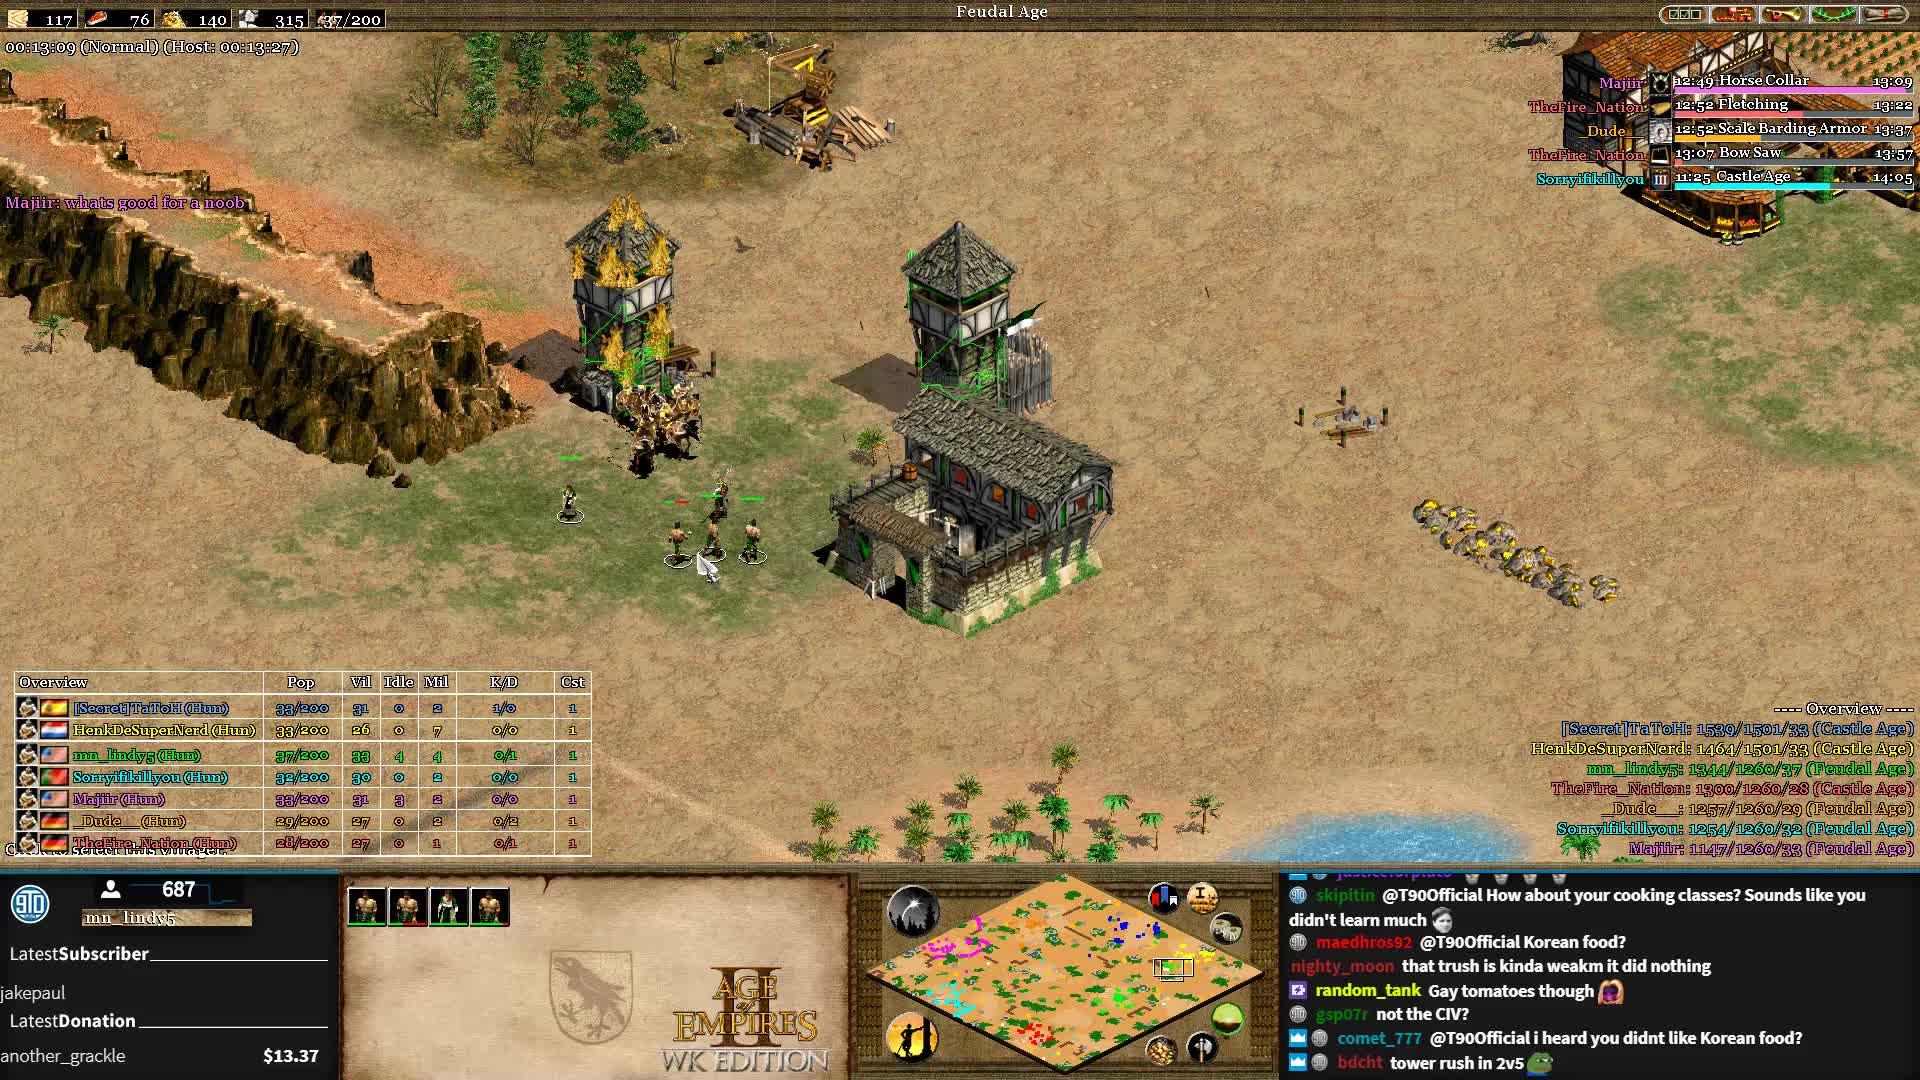 T90Official - T90 hates Koreans - Twitch